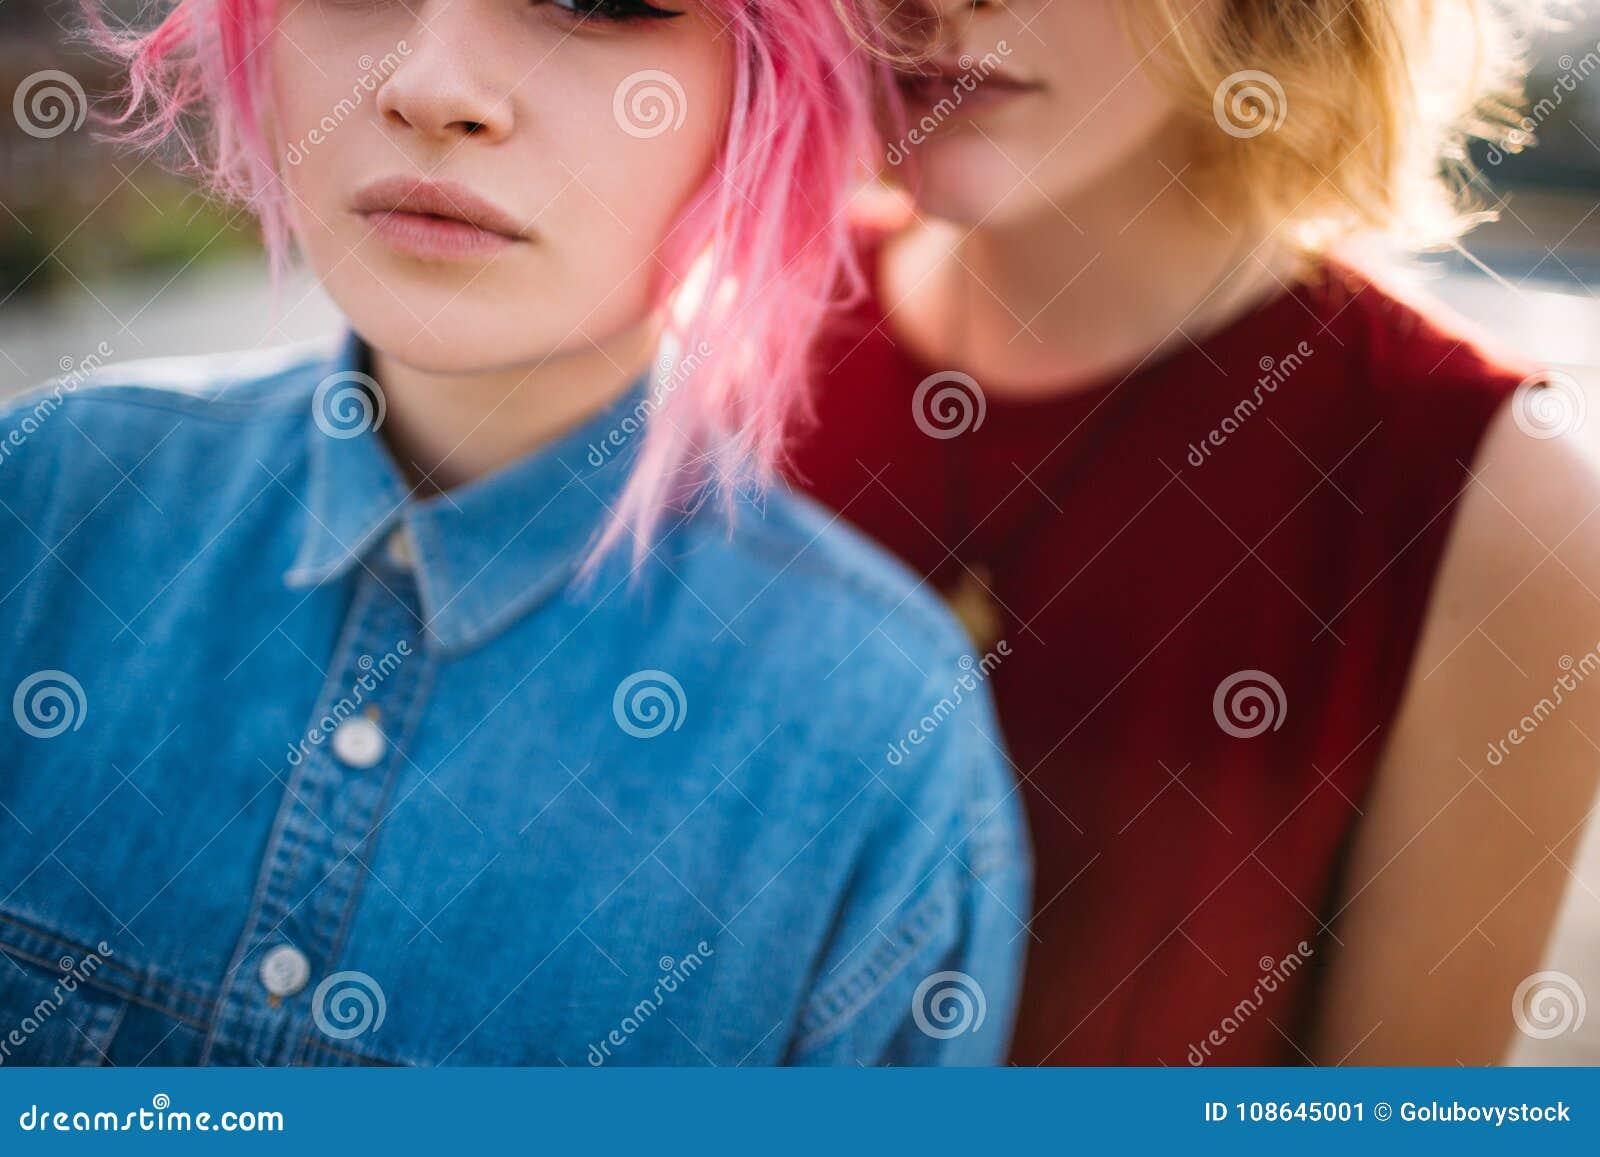 Г©tudiant lesbienne sexe